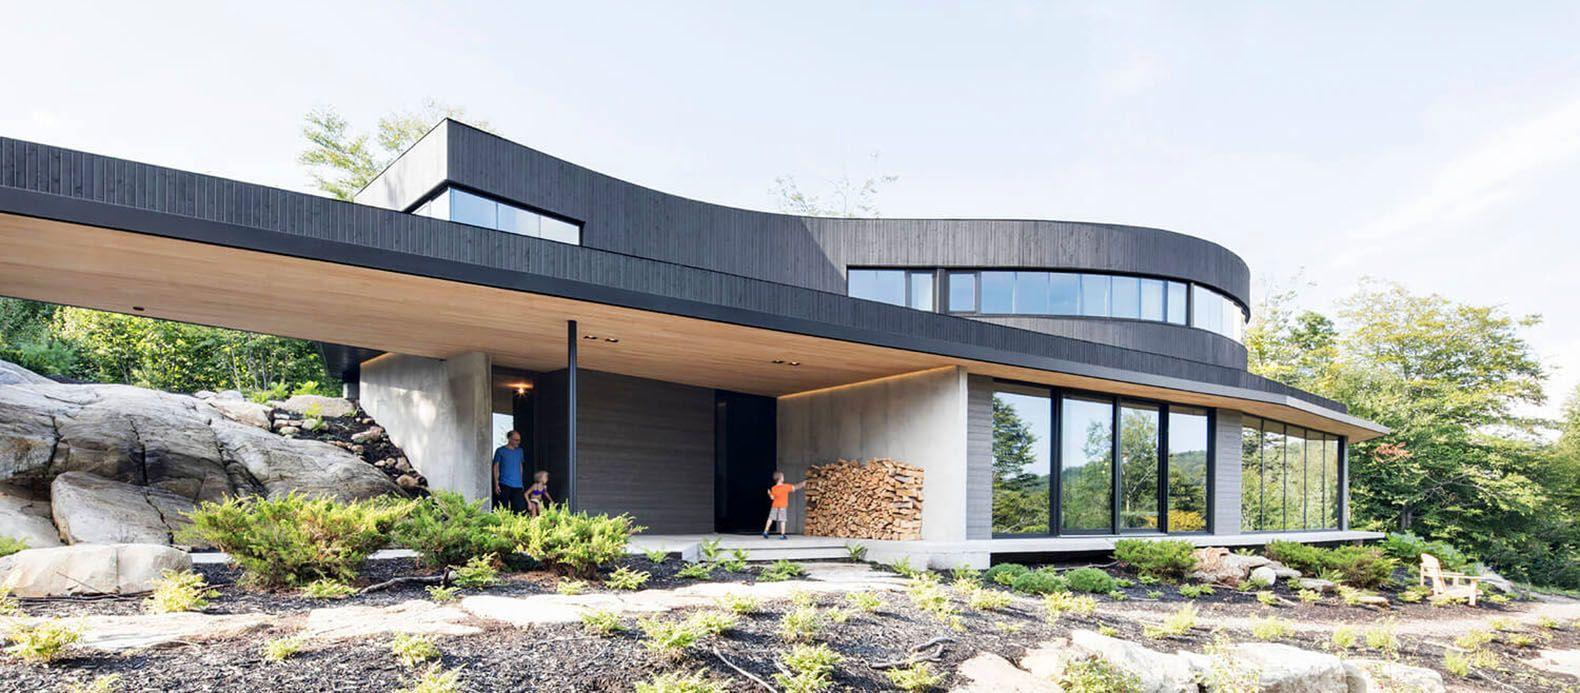 Building off grid homes - Building Off Grid Homes 4